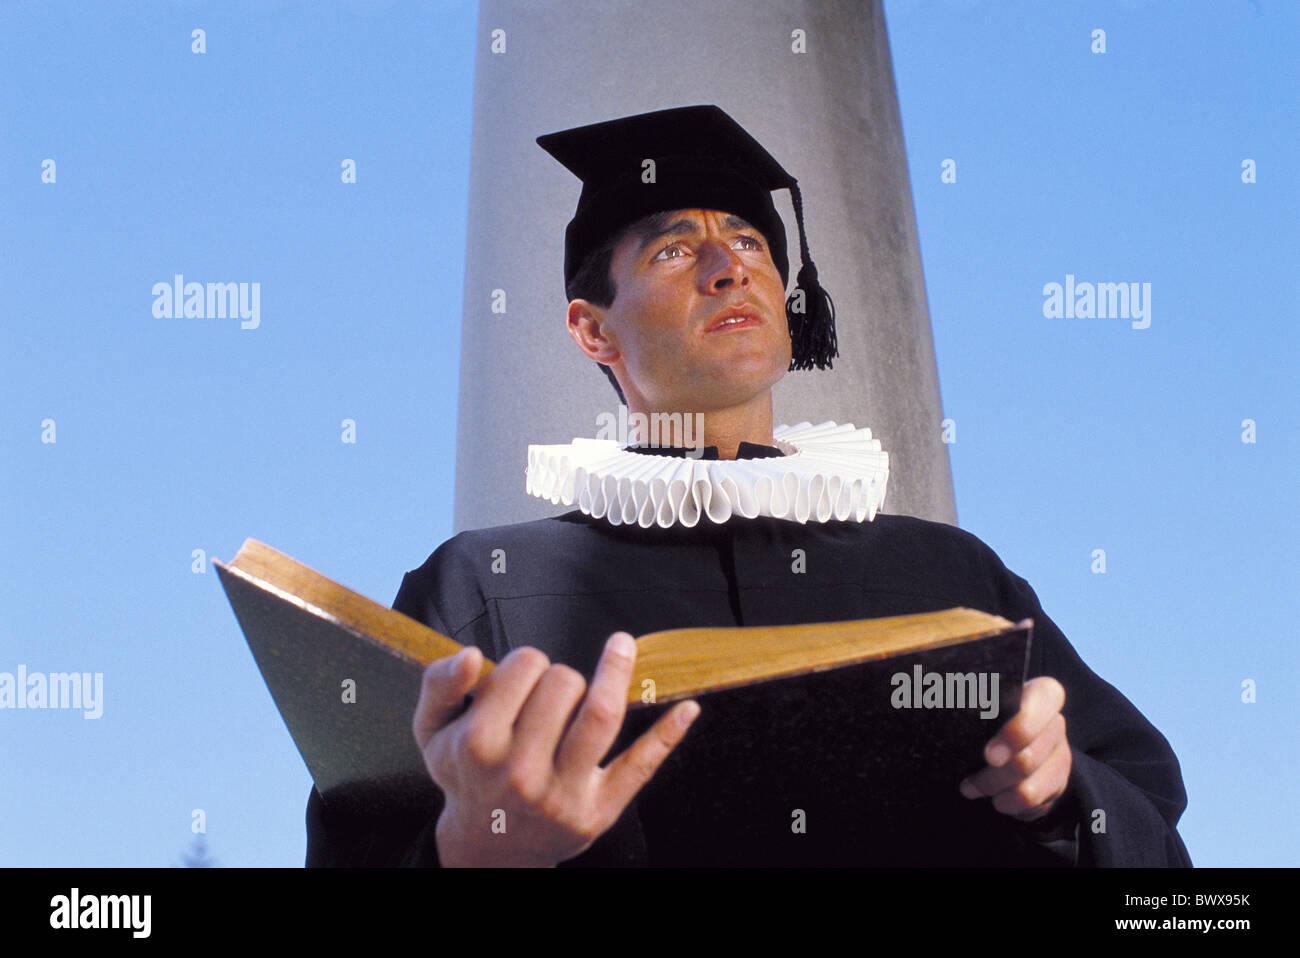 Le juge justice droit code direct joint tour Photo Stock